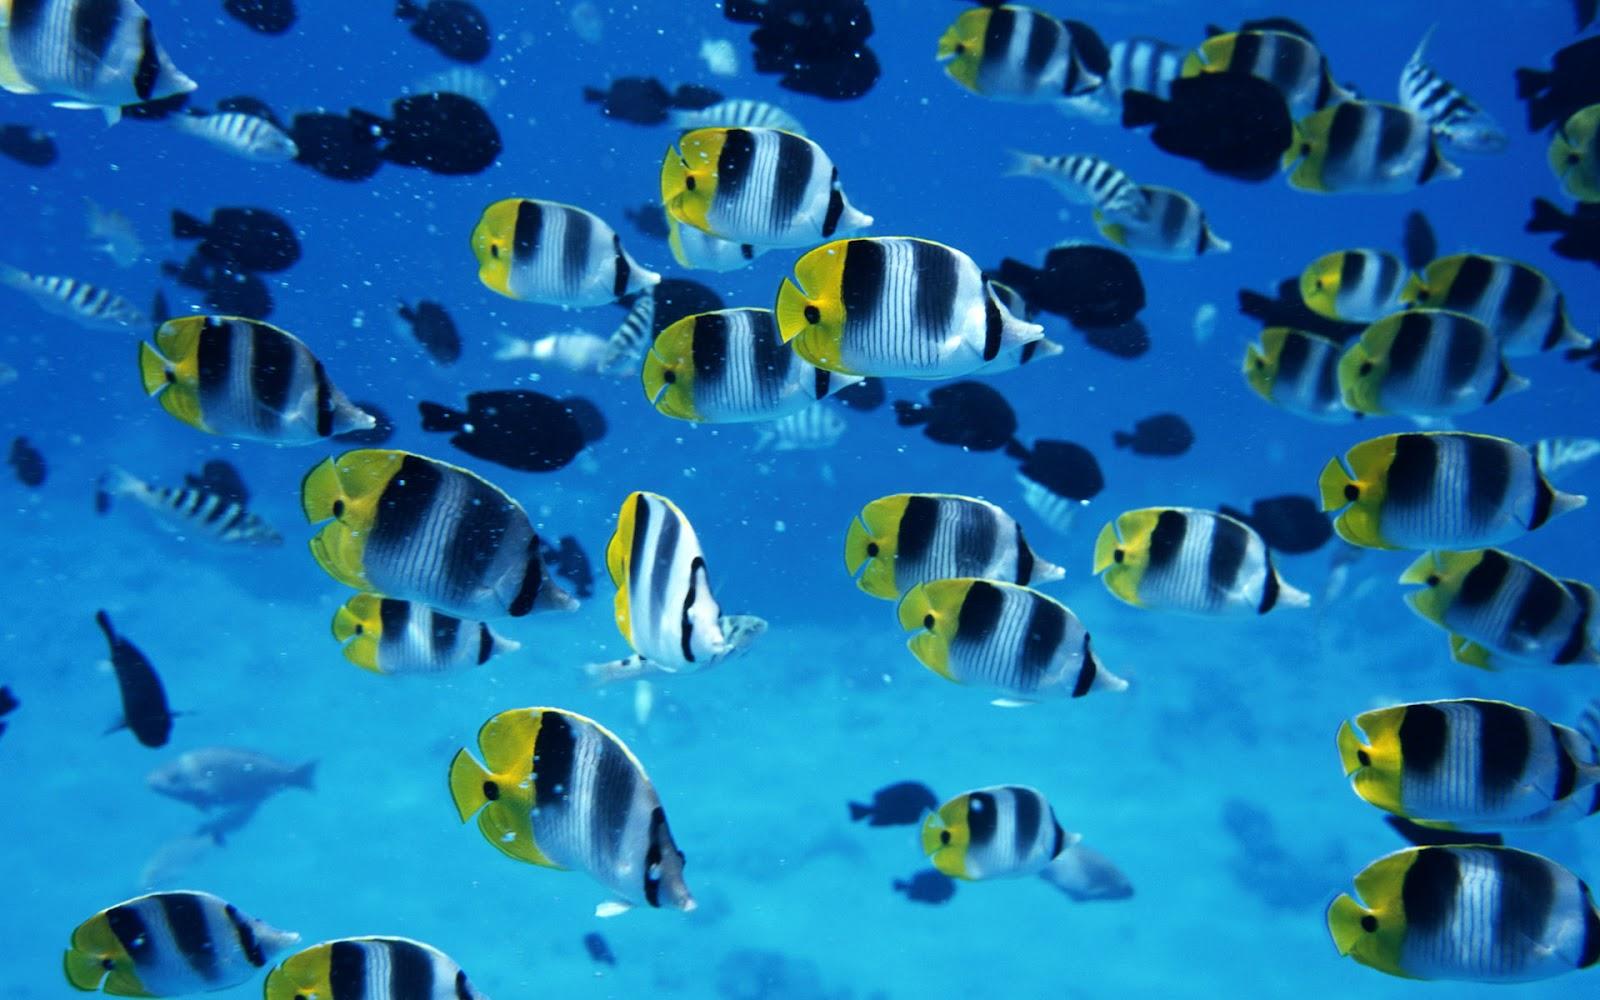 Wallpaper backgrounds l desktop wallpapers l download for Big fish in the ocean